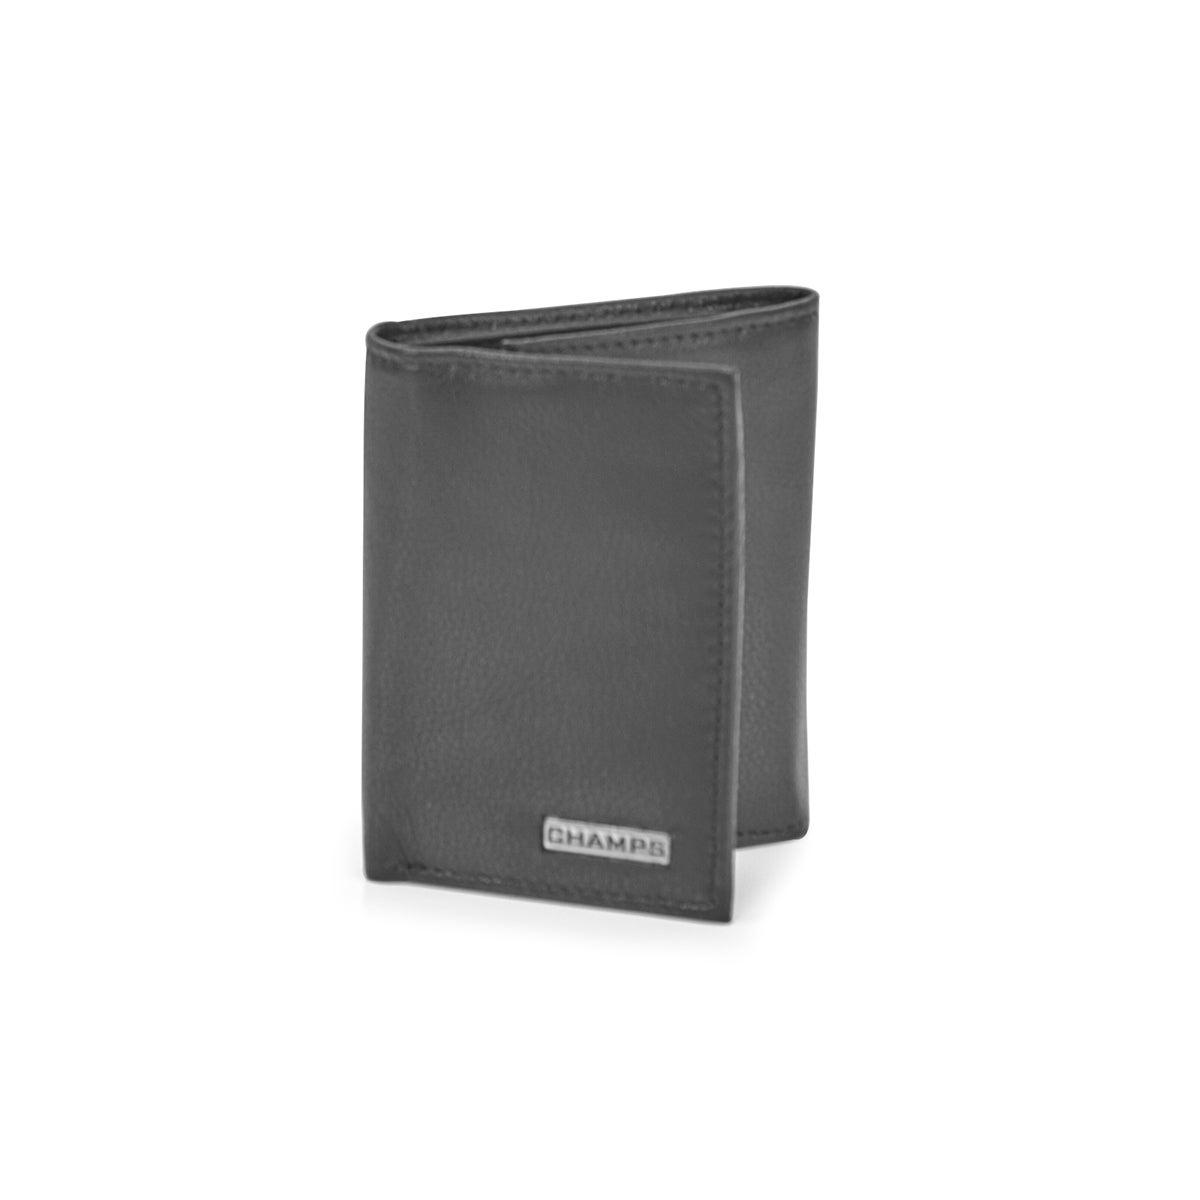 Men's MW-804-BLK cowhide leather wallets